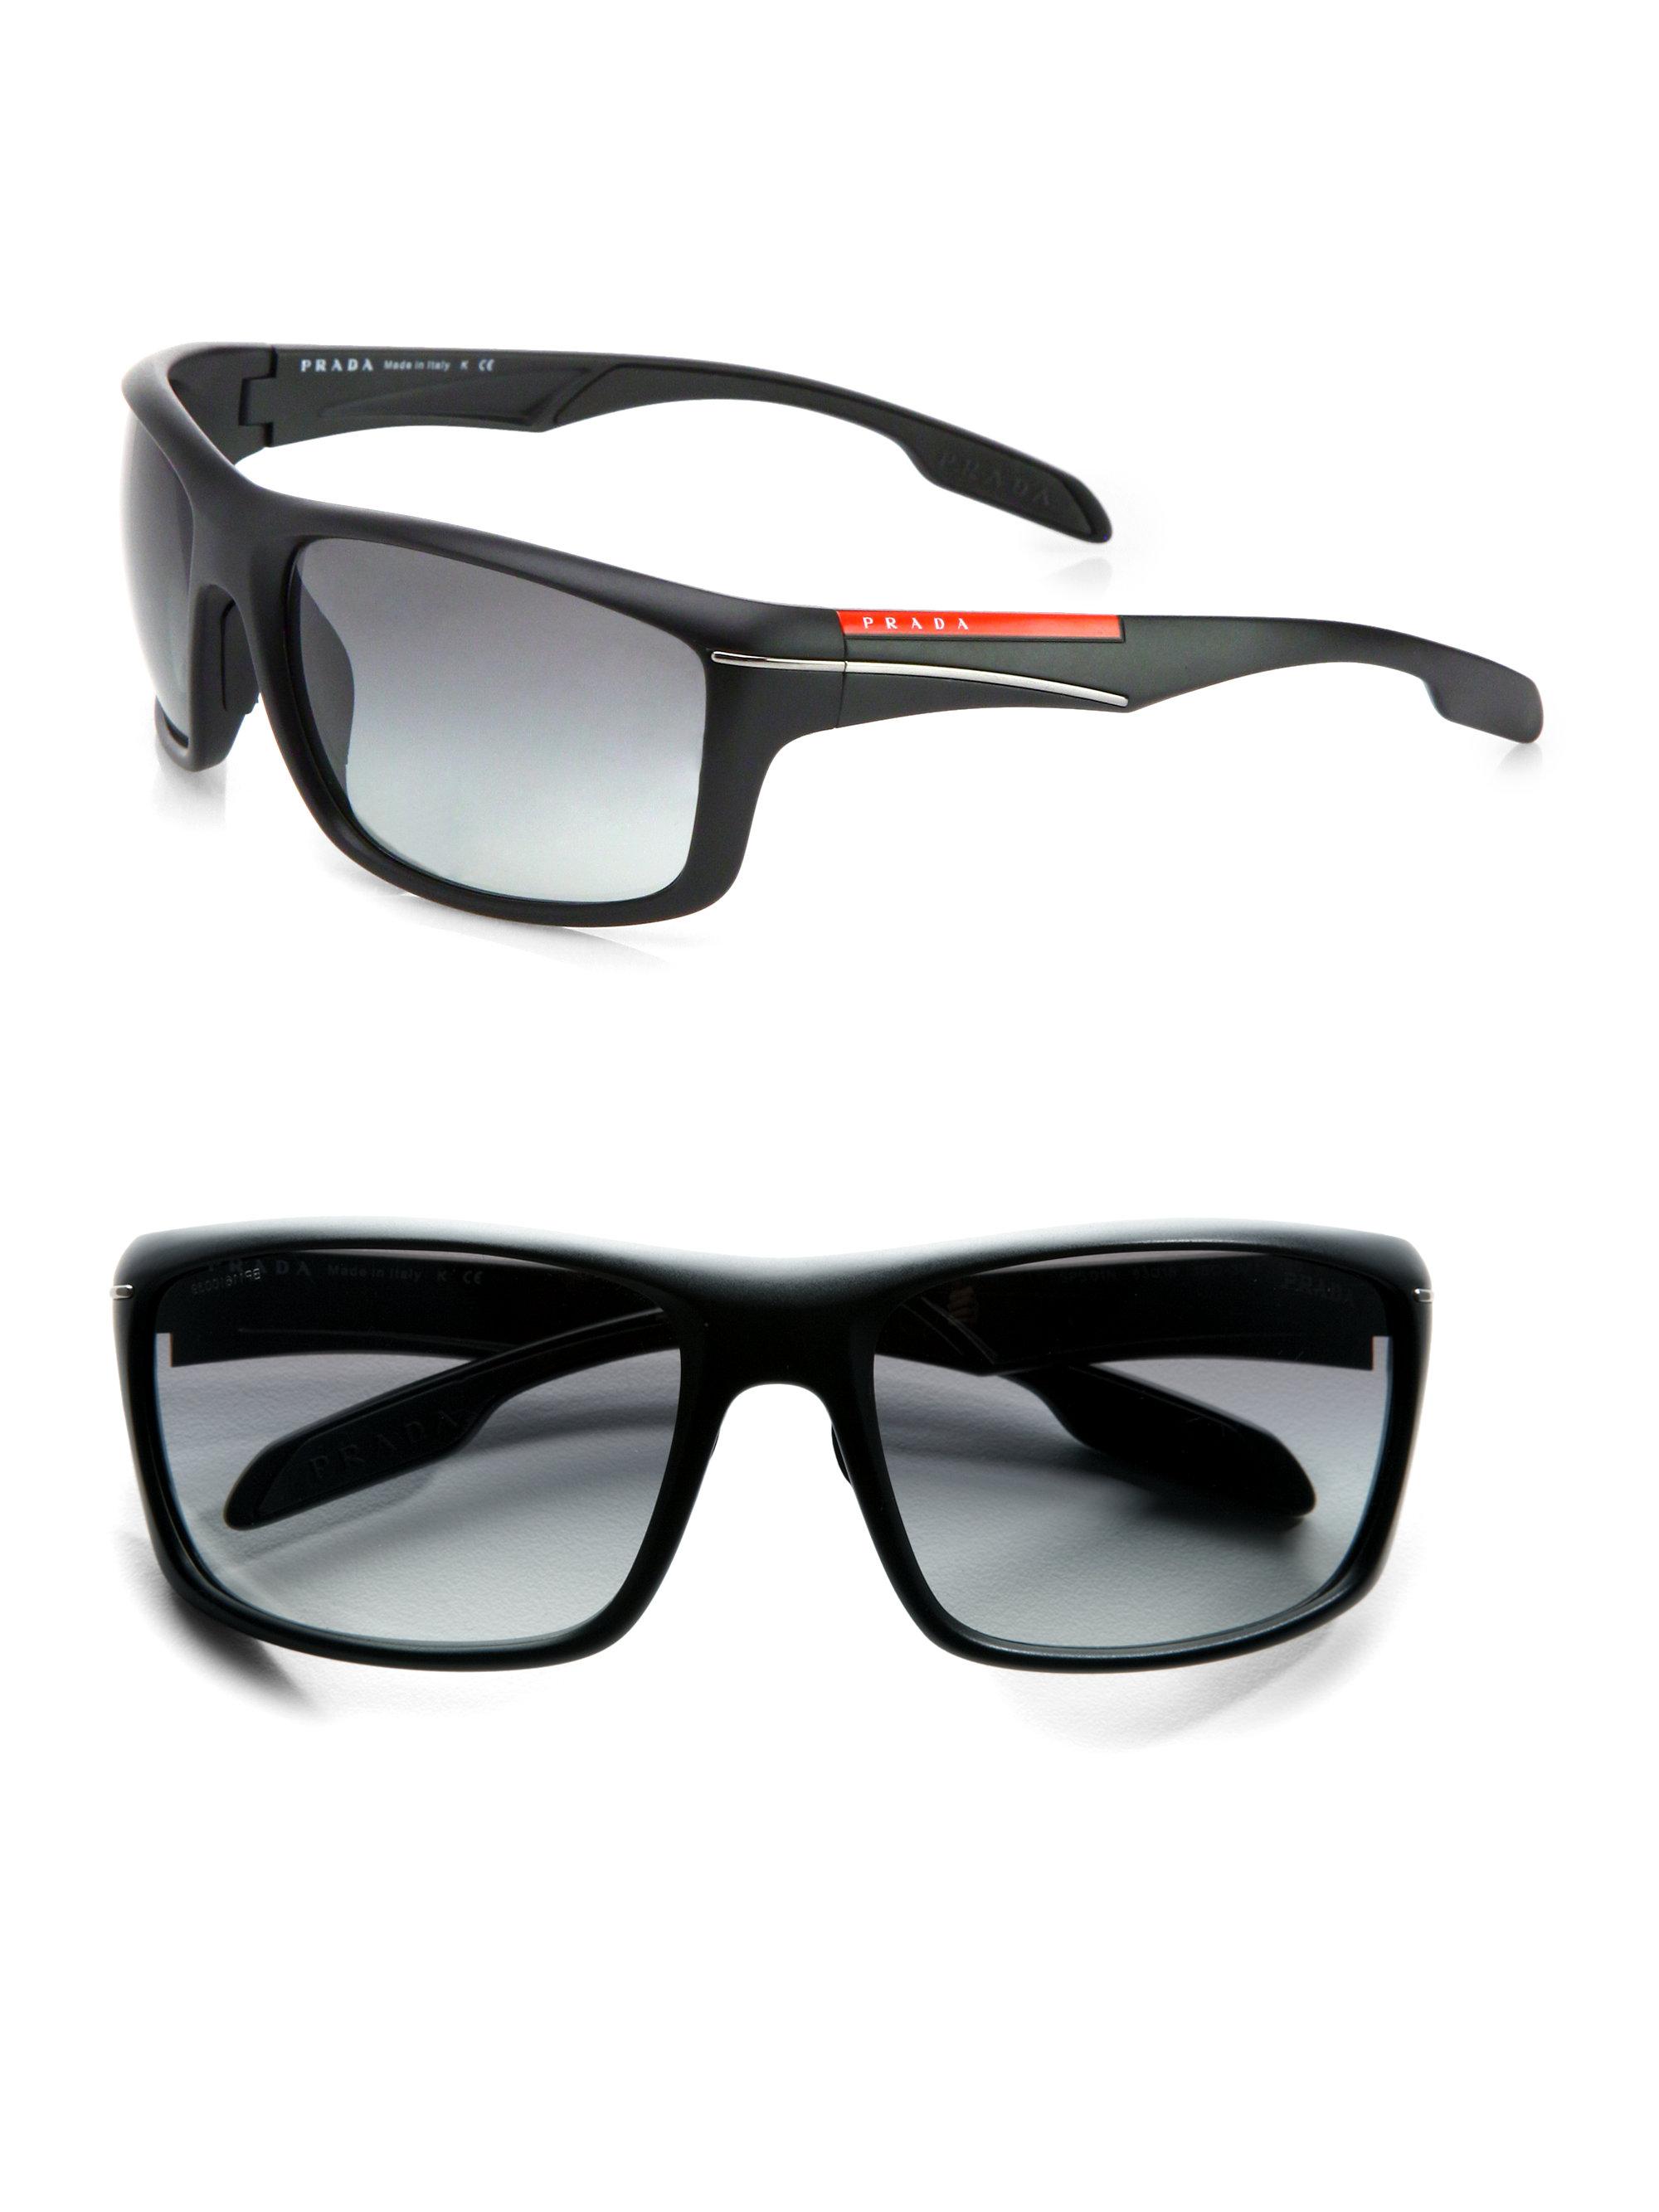 2dca1ec7e96 Lyst - Prada Sport Wrap Sunglasses in Black for Men